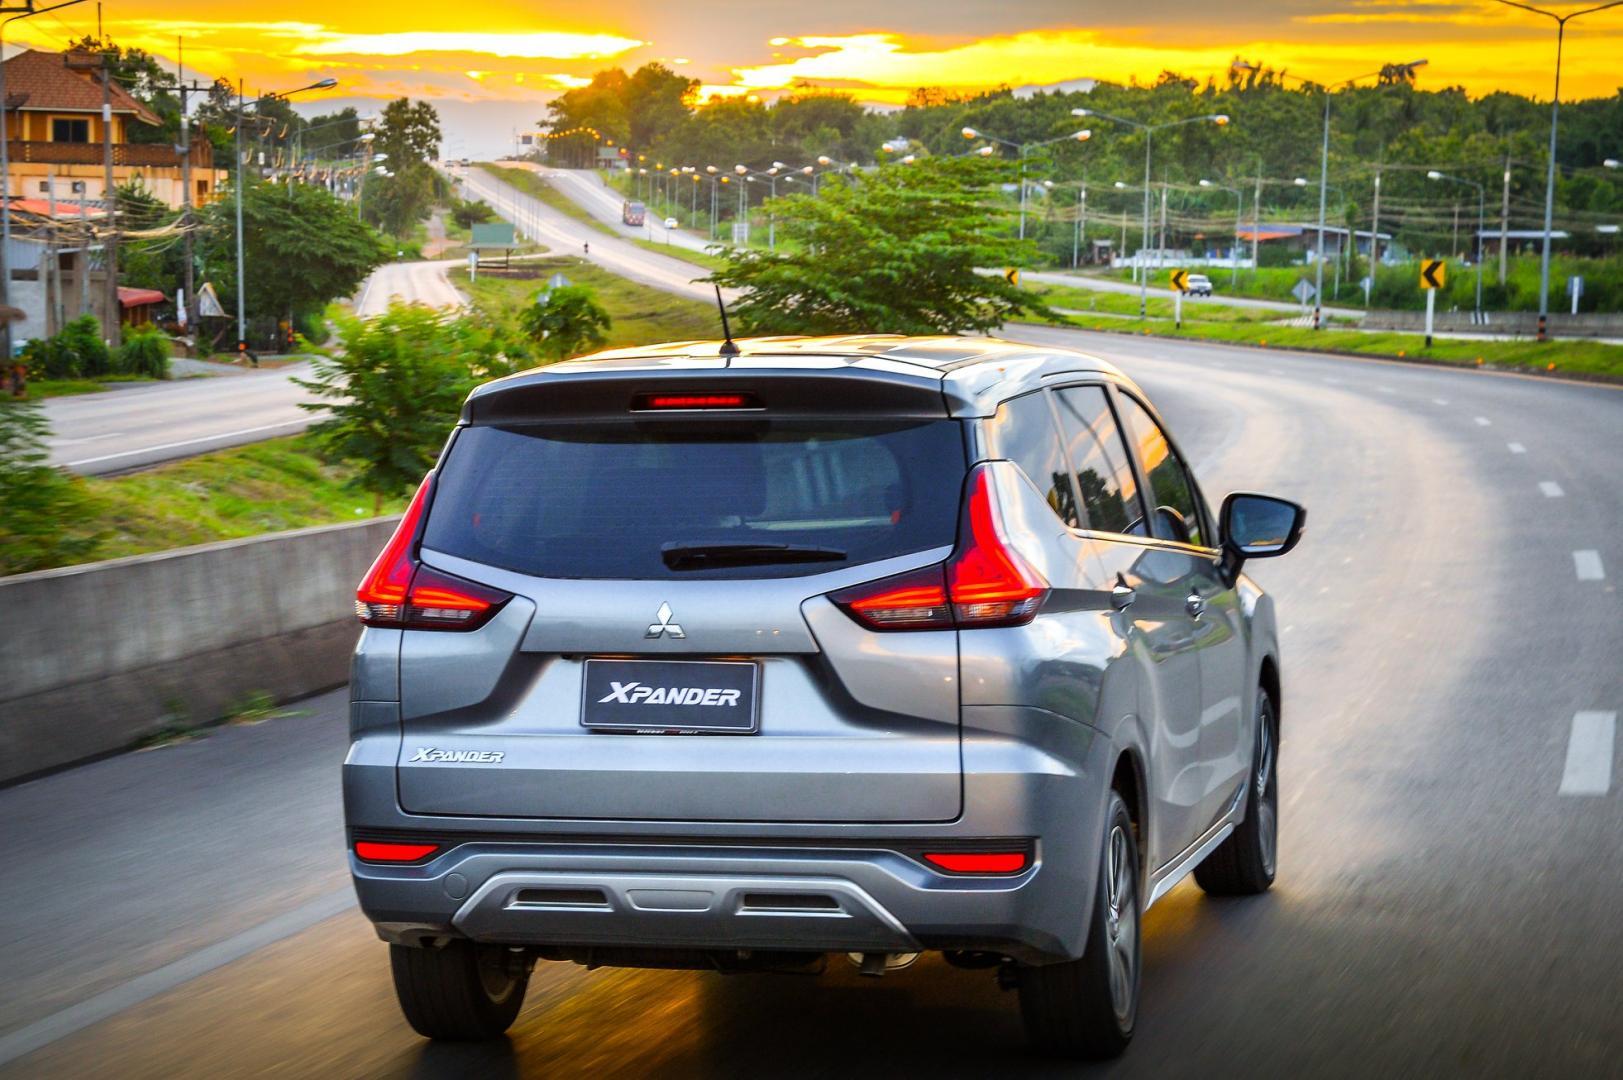 Mitsubishi Xpander MPV Launched In Thailand